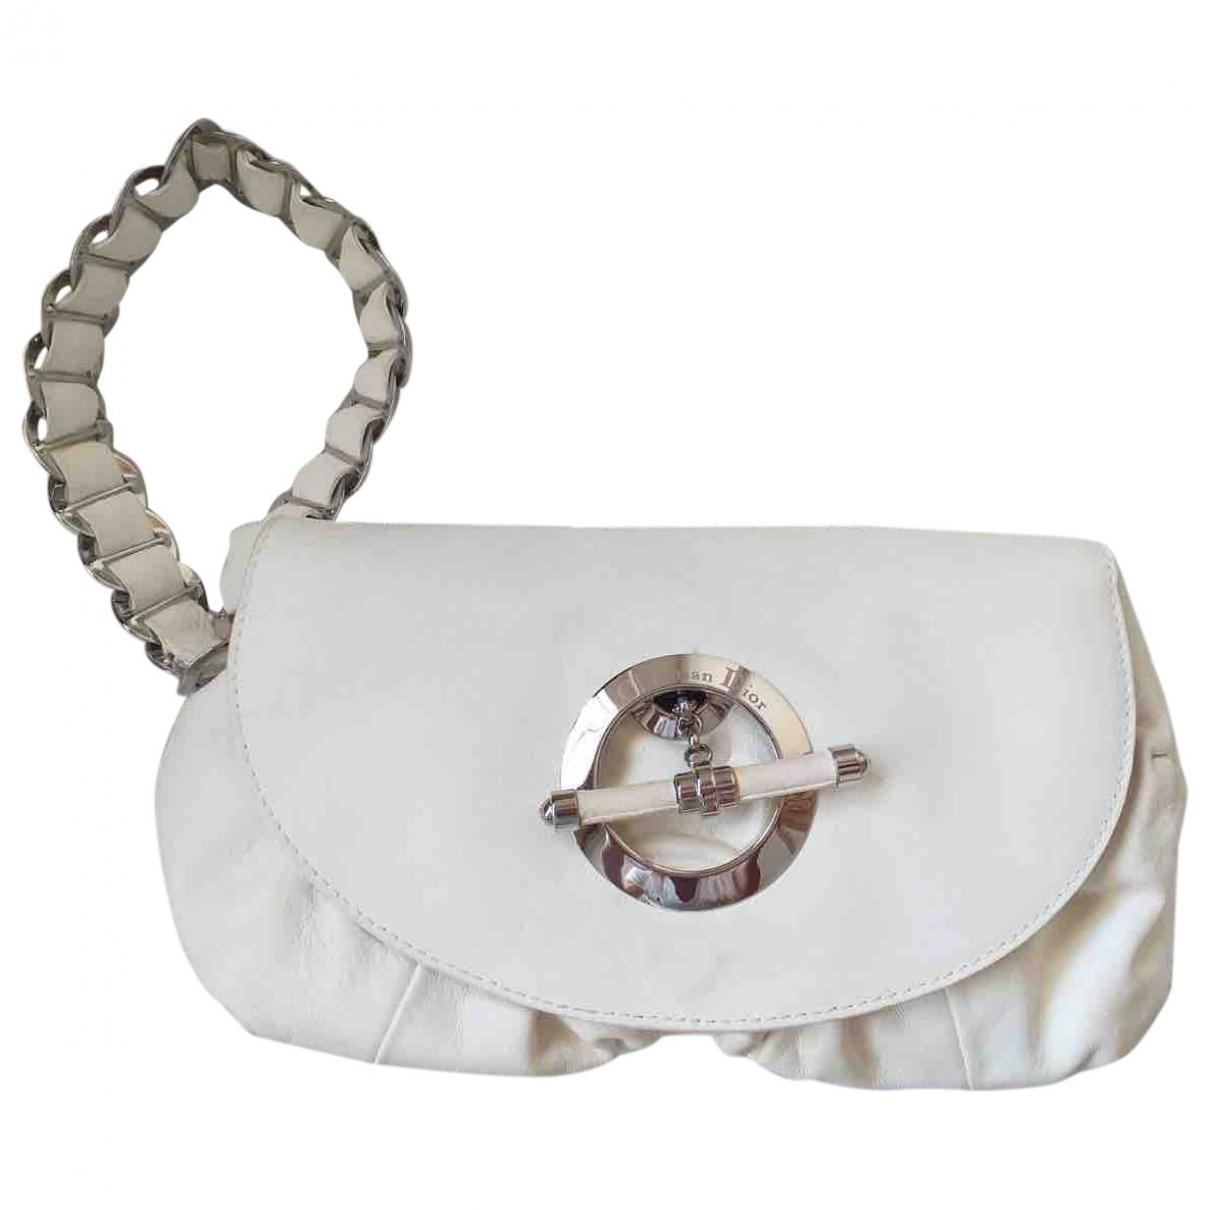 Dior \N White Leather Clutch bag for Women \N